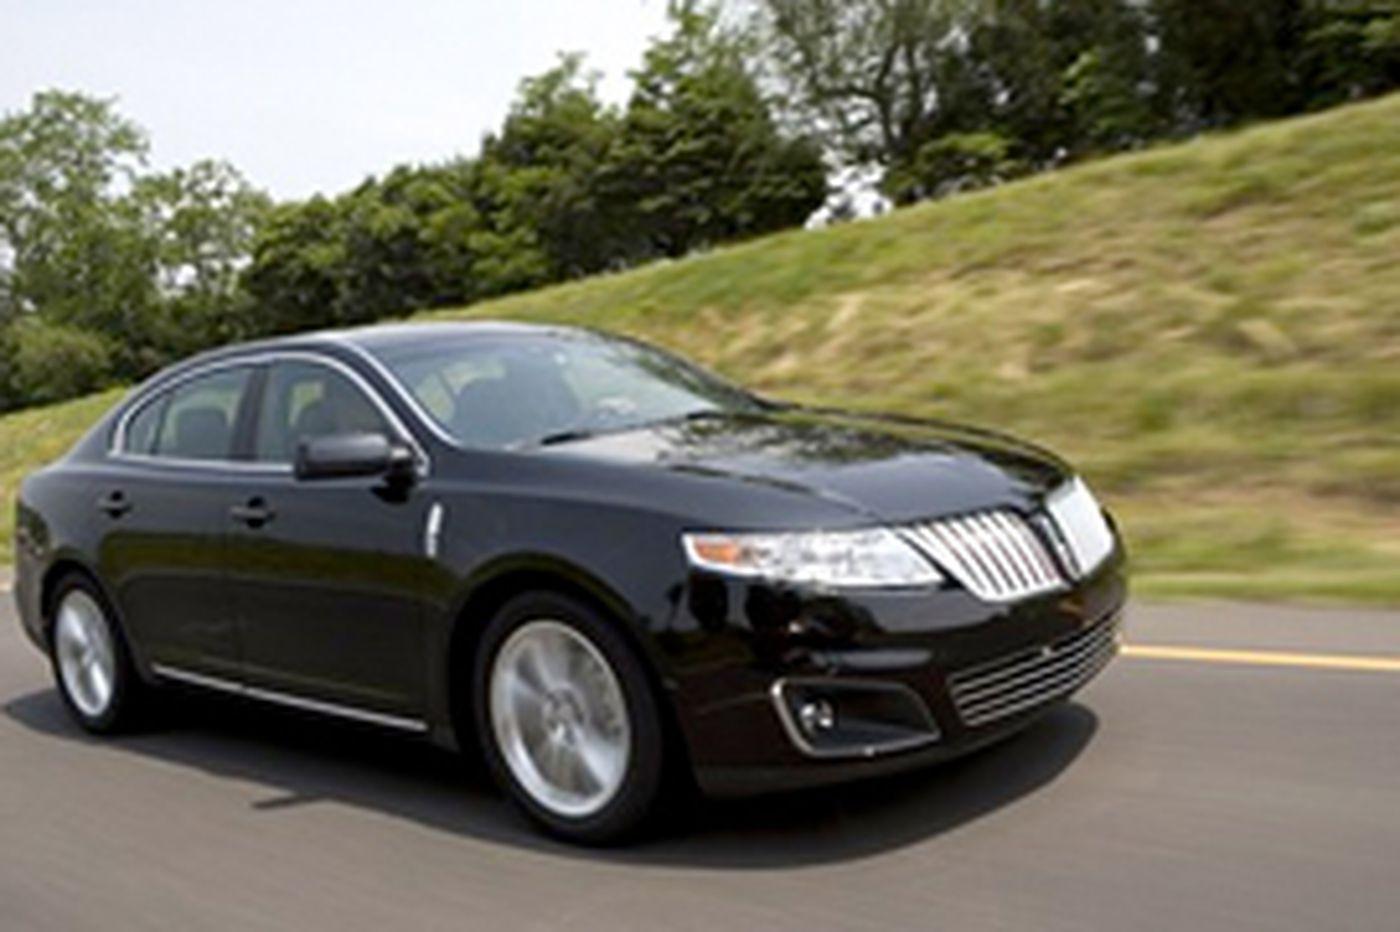 '09 Lincoln MKS: Stylish, high-tech